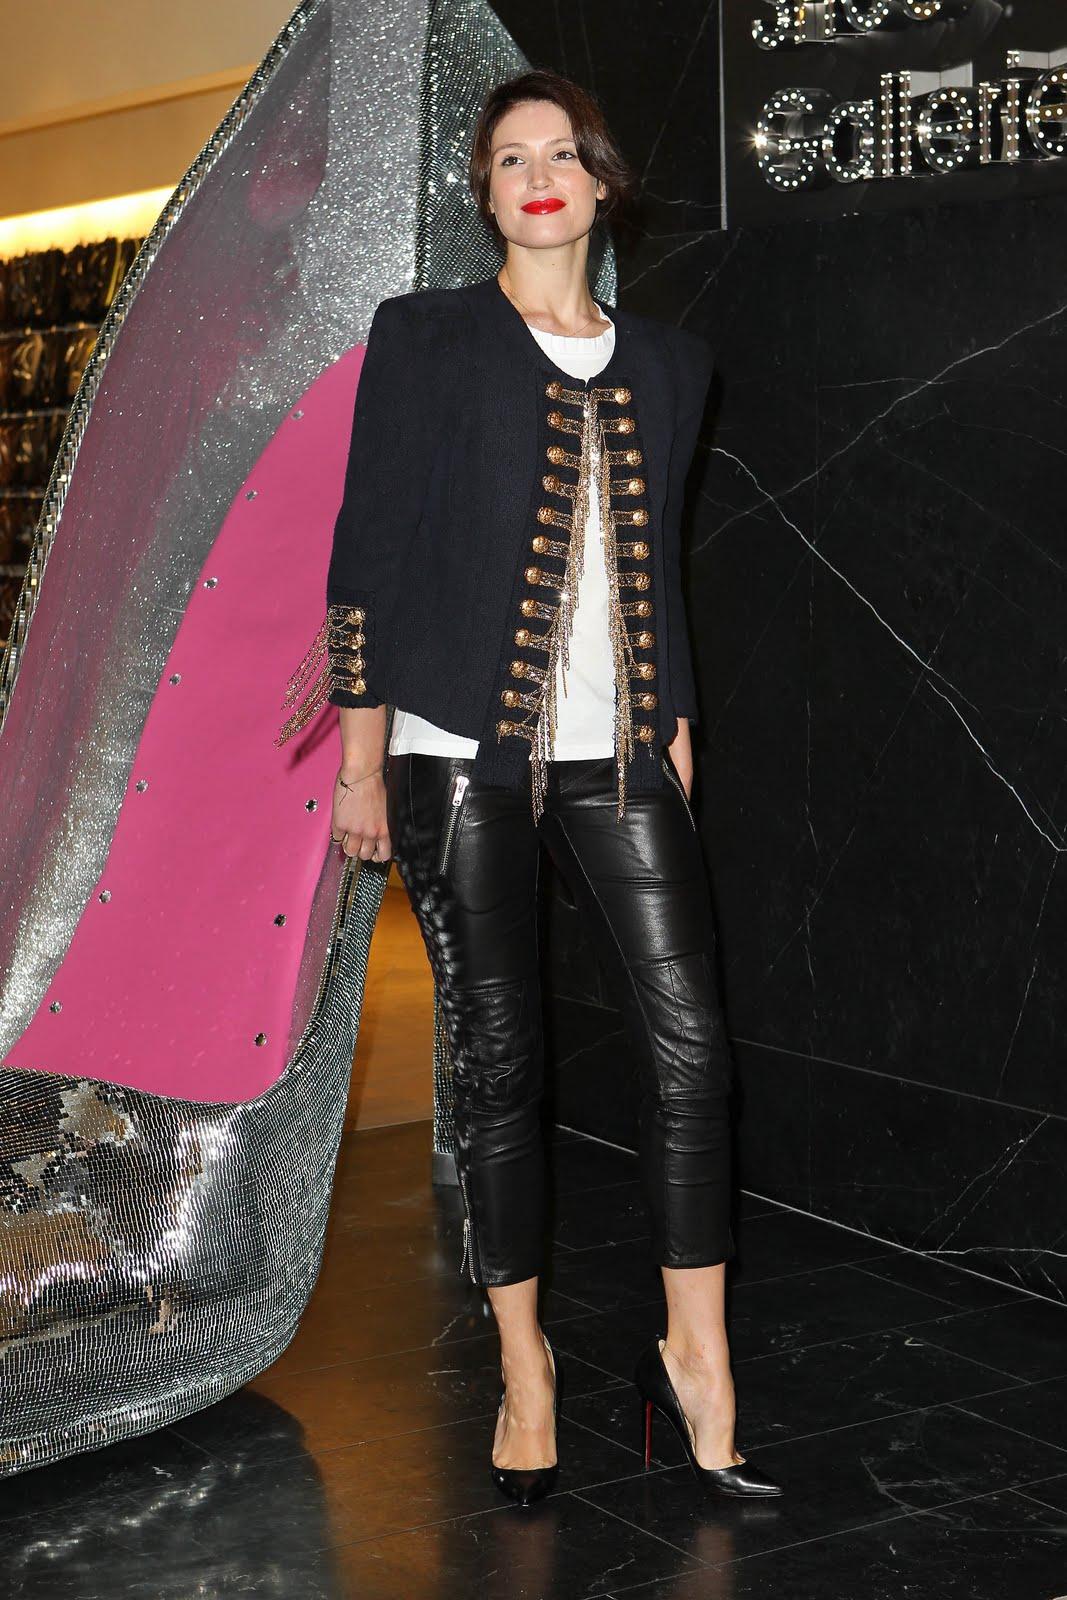 http://1.bp.blogspot.com/_5wt45Sgxoi8/TJxW2xeDUKI/AAAAAAAAChw/dFjBFOg76Rk/s1600/gemma_arterton_leather_leggings_3.jpg